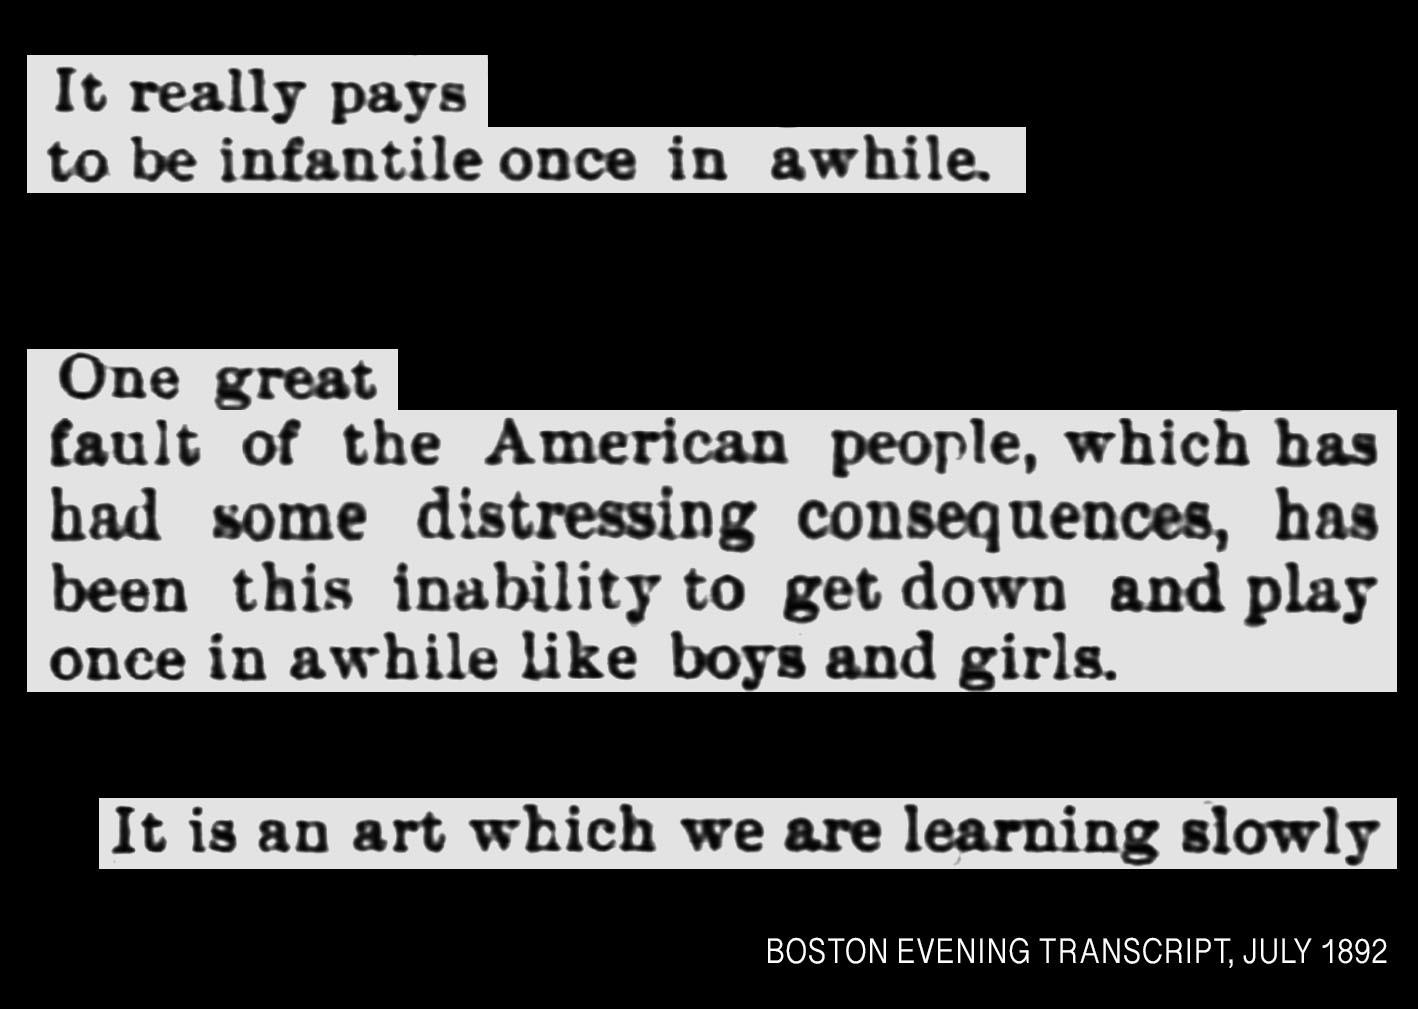 Boston Evening Transcript